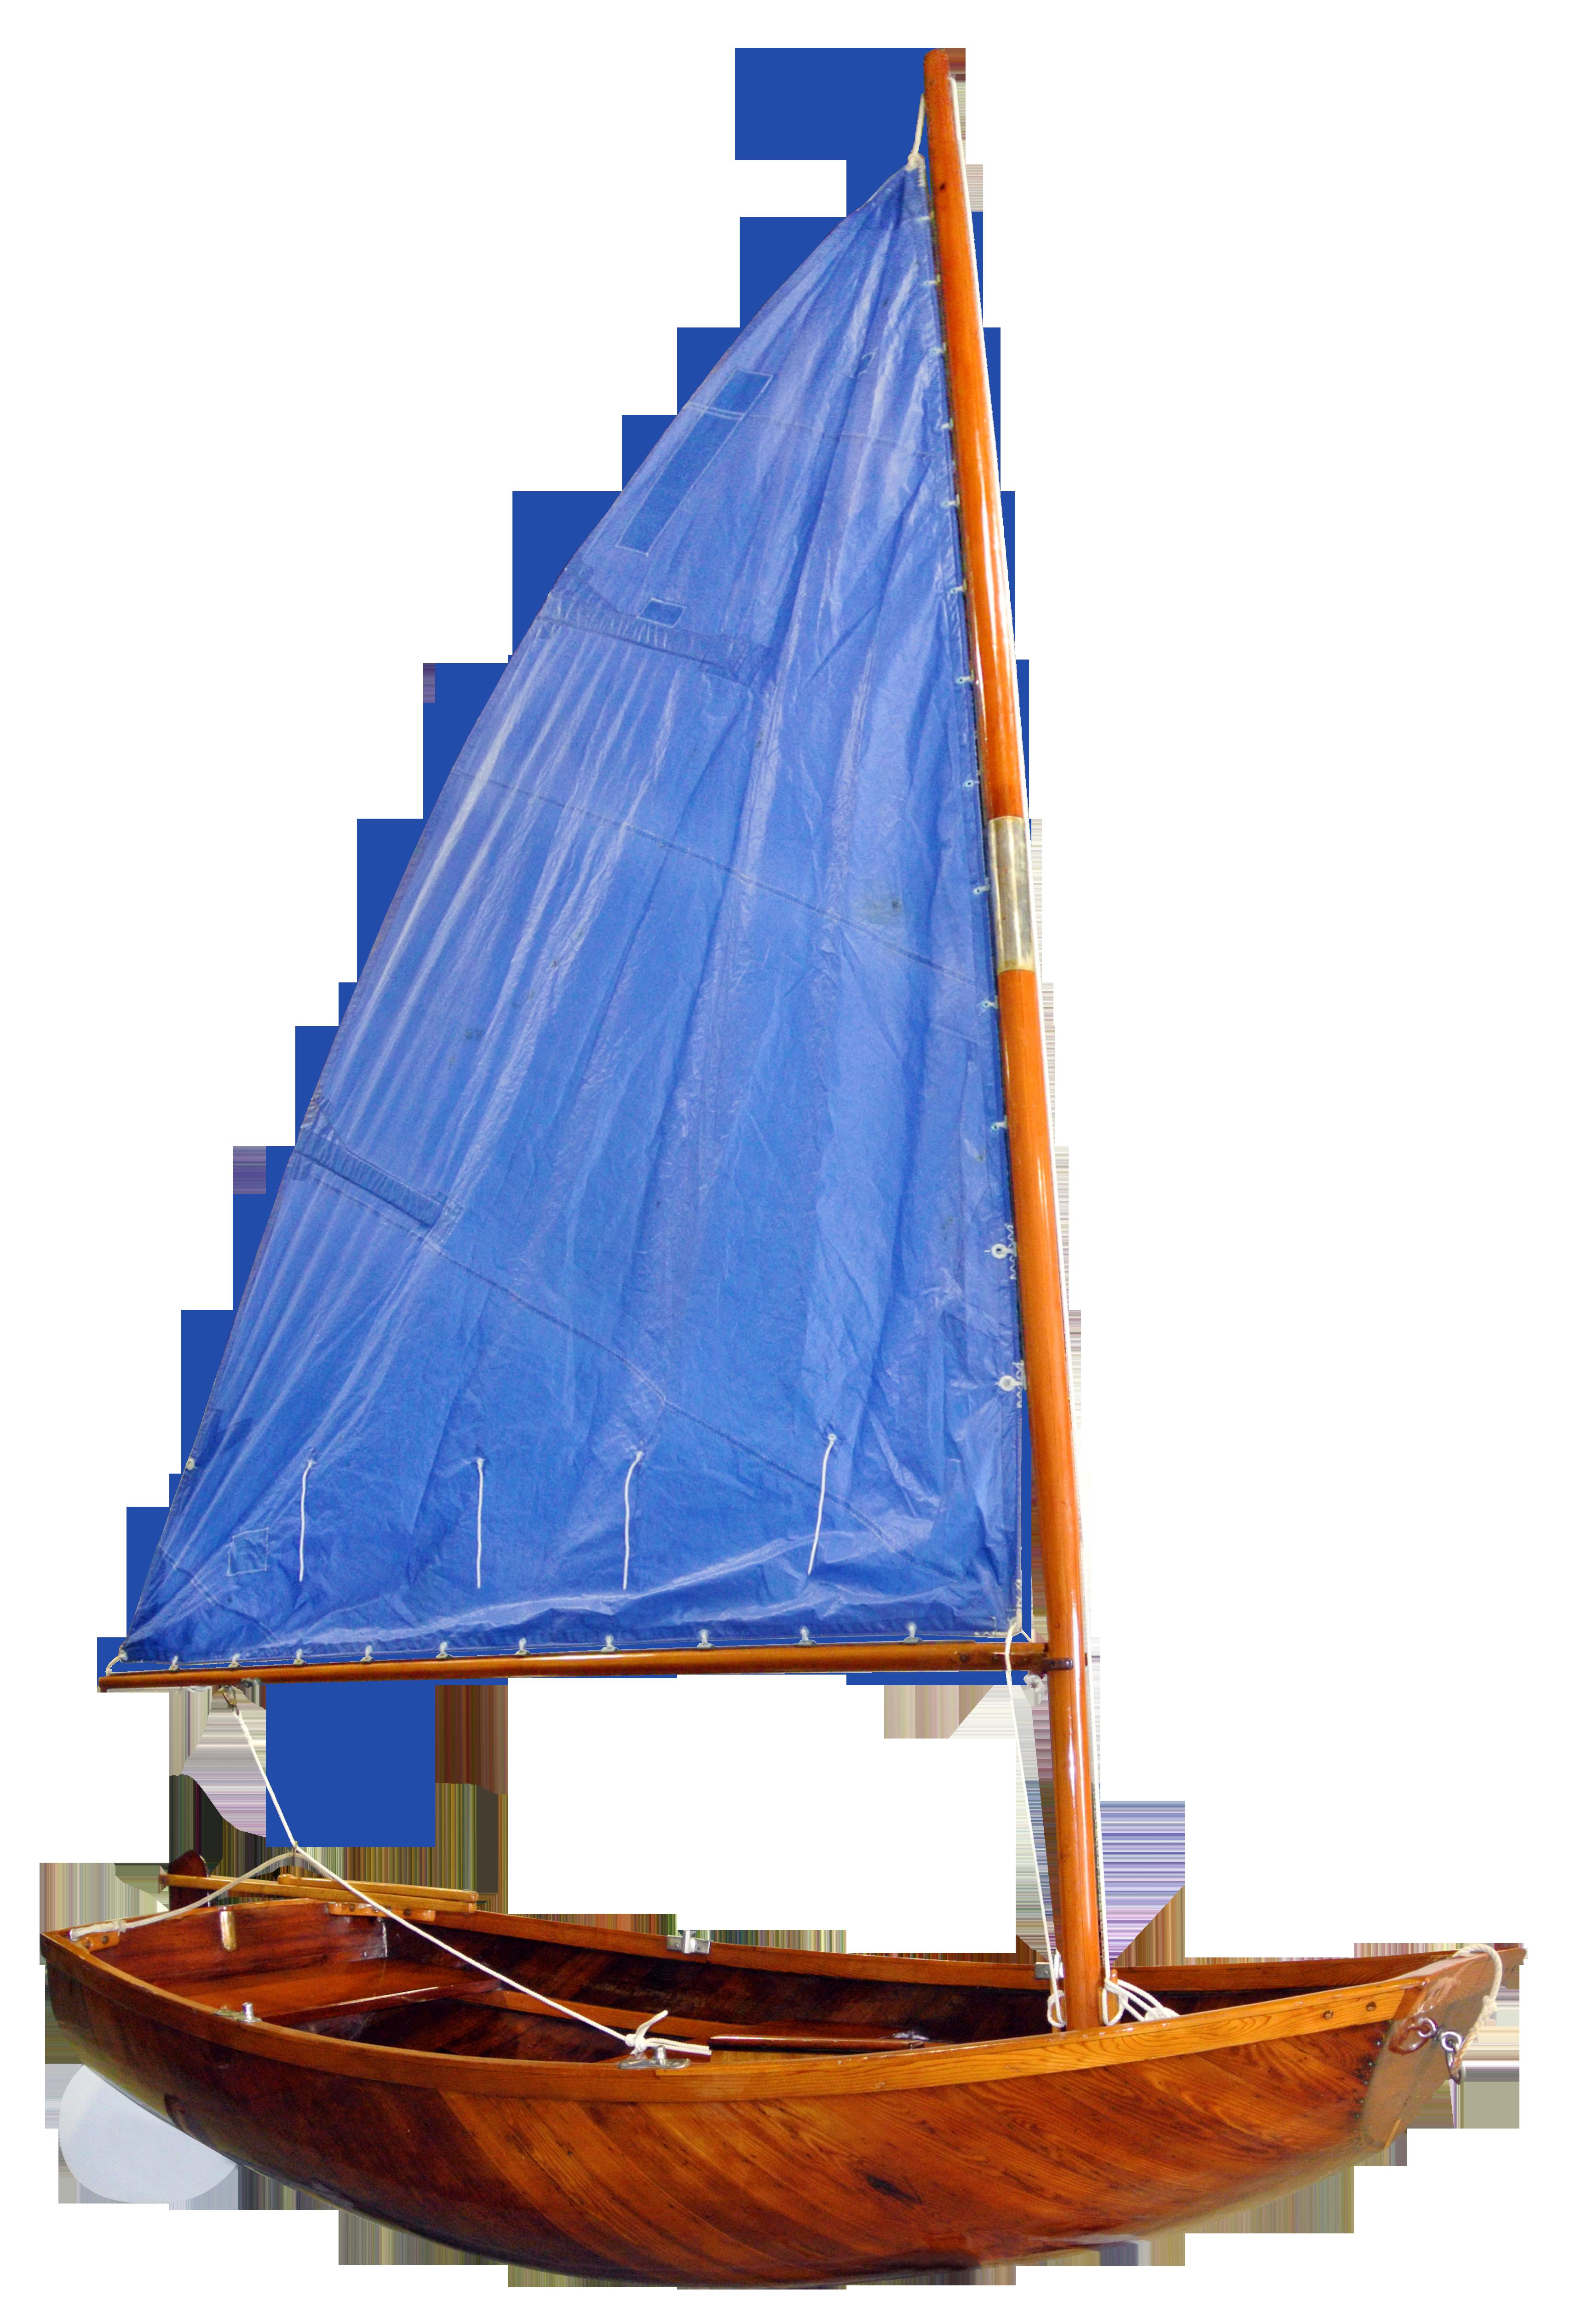 Raffle clipart transparent background. Png sailing images pluspng